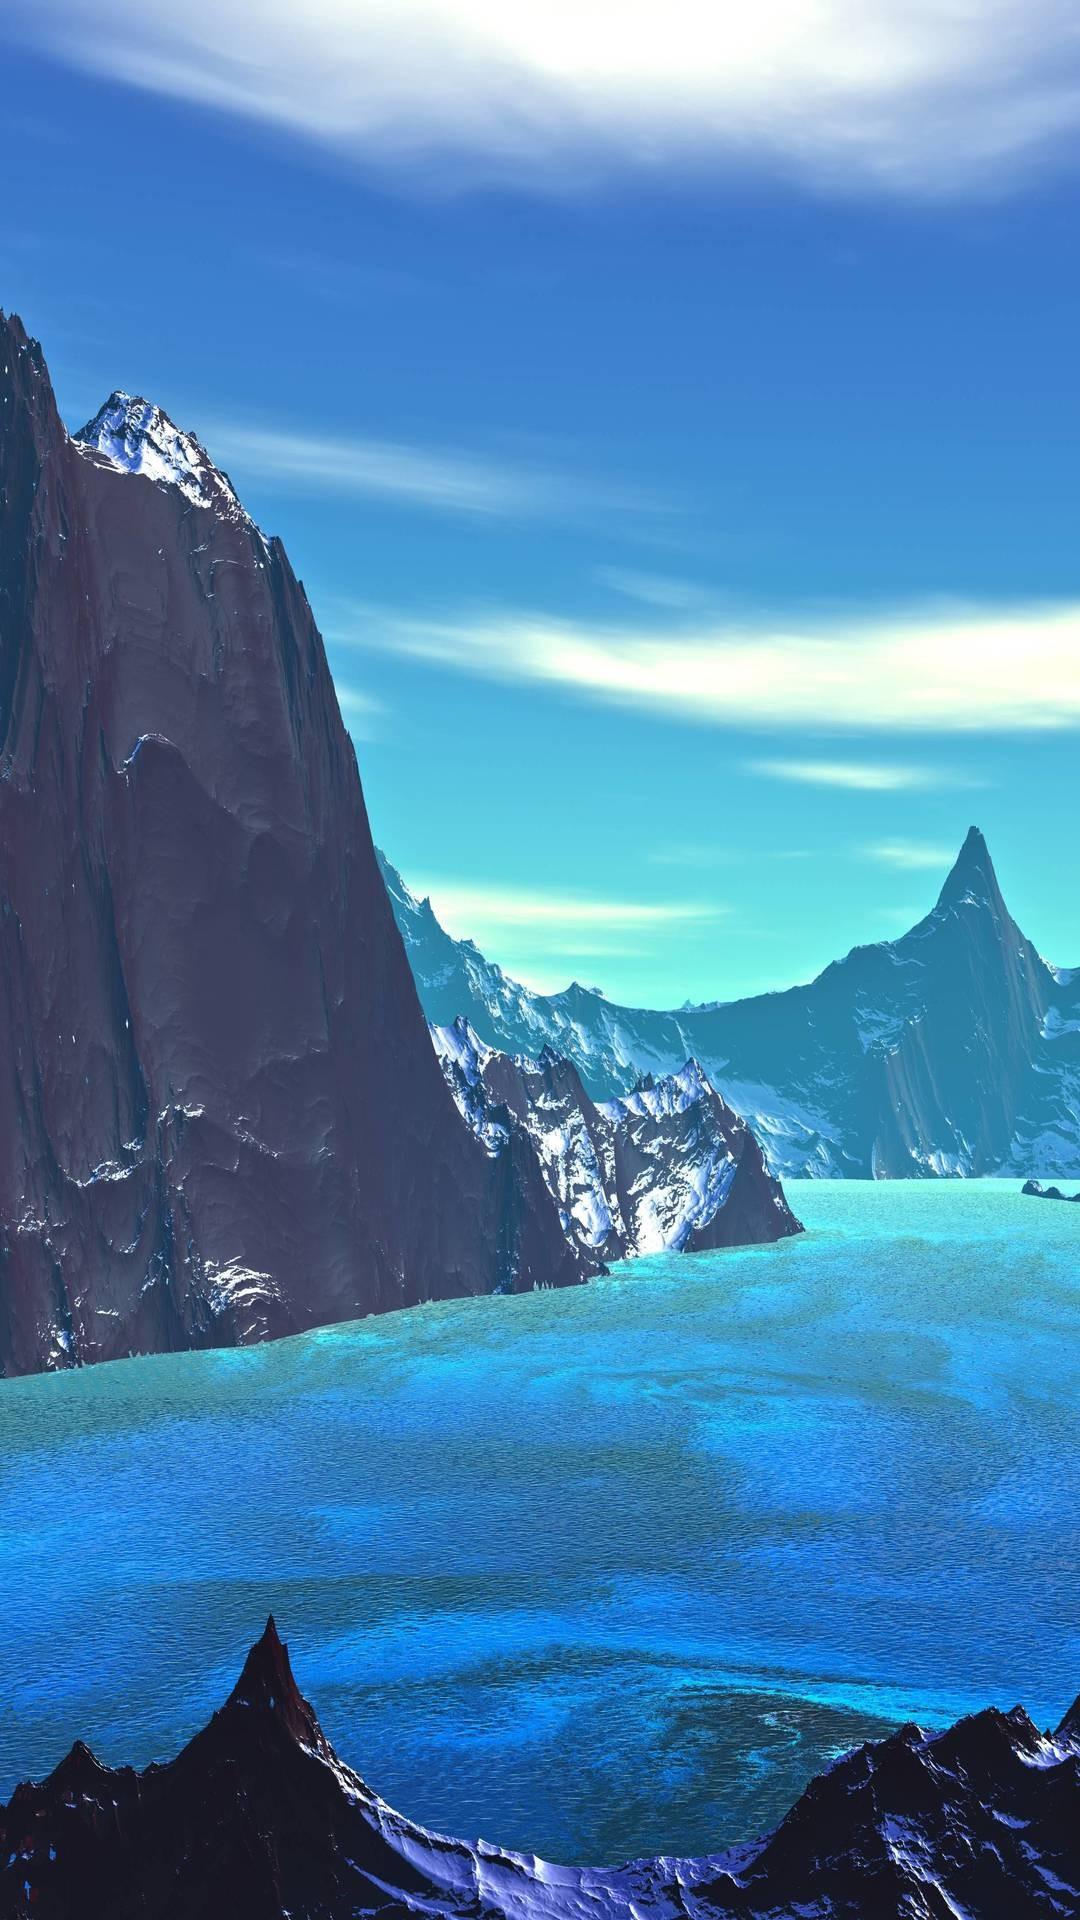 Under The Sea Wallpaper Hd Lake 8k Blue Landscape Artistic Vn Wallpaper 1080x1920